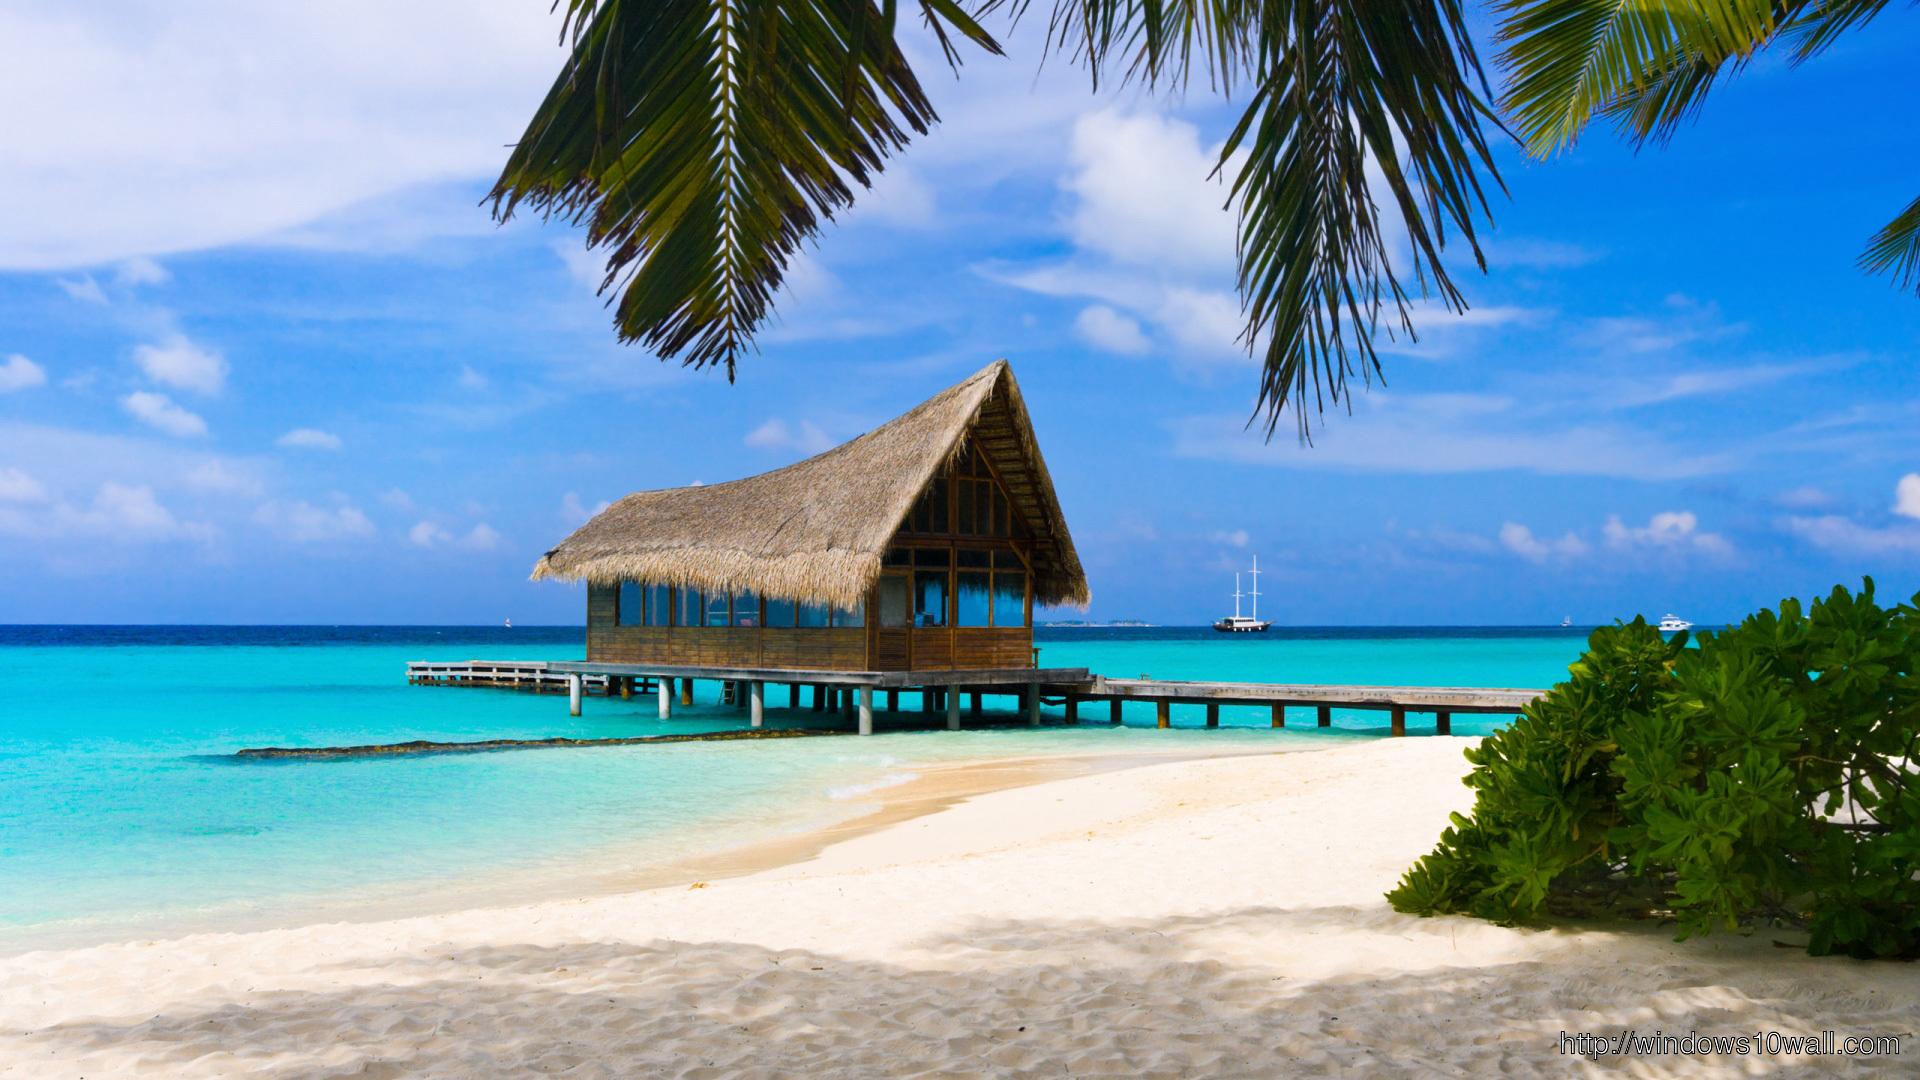 Tropical Paradise Beach 4k Hd Desktop Wallpaper For 4k: Beach Paradise HD Wallpaper